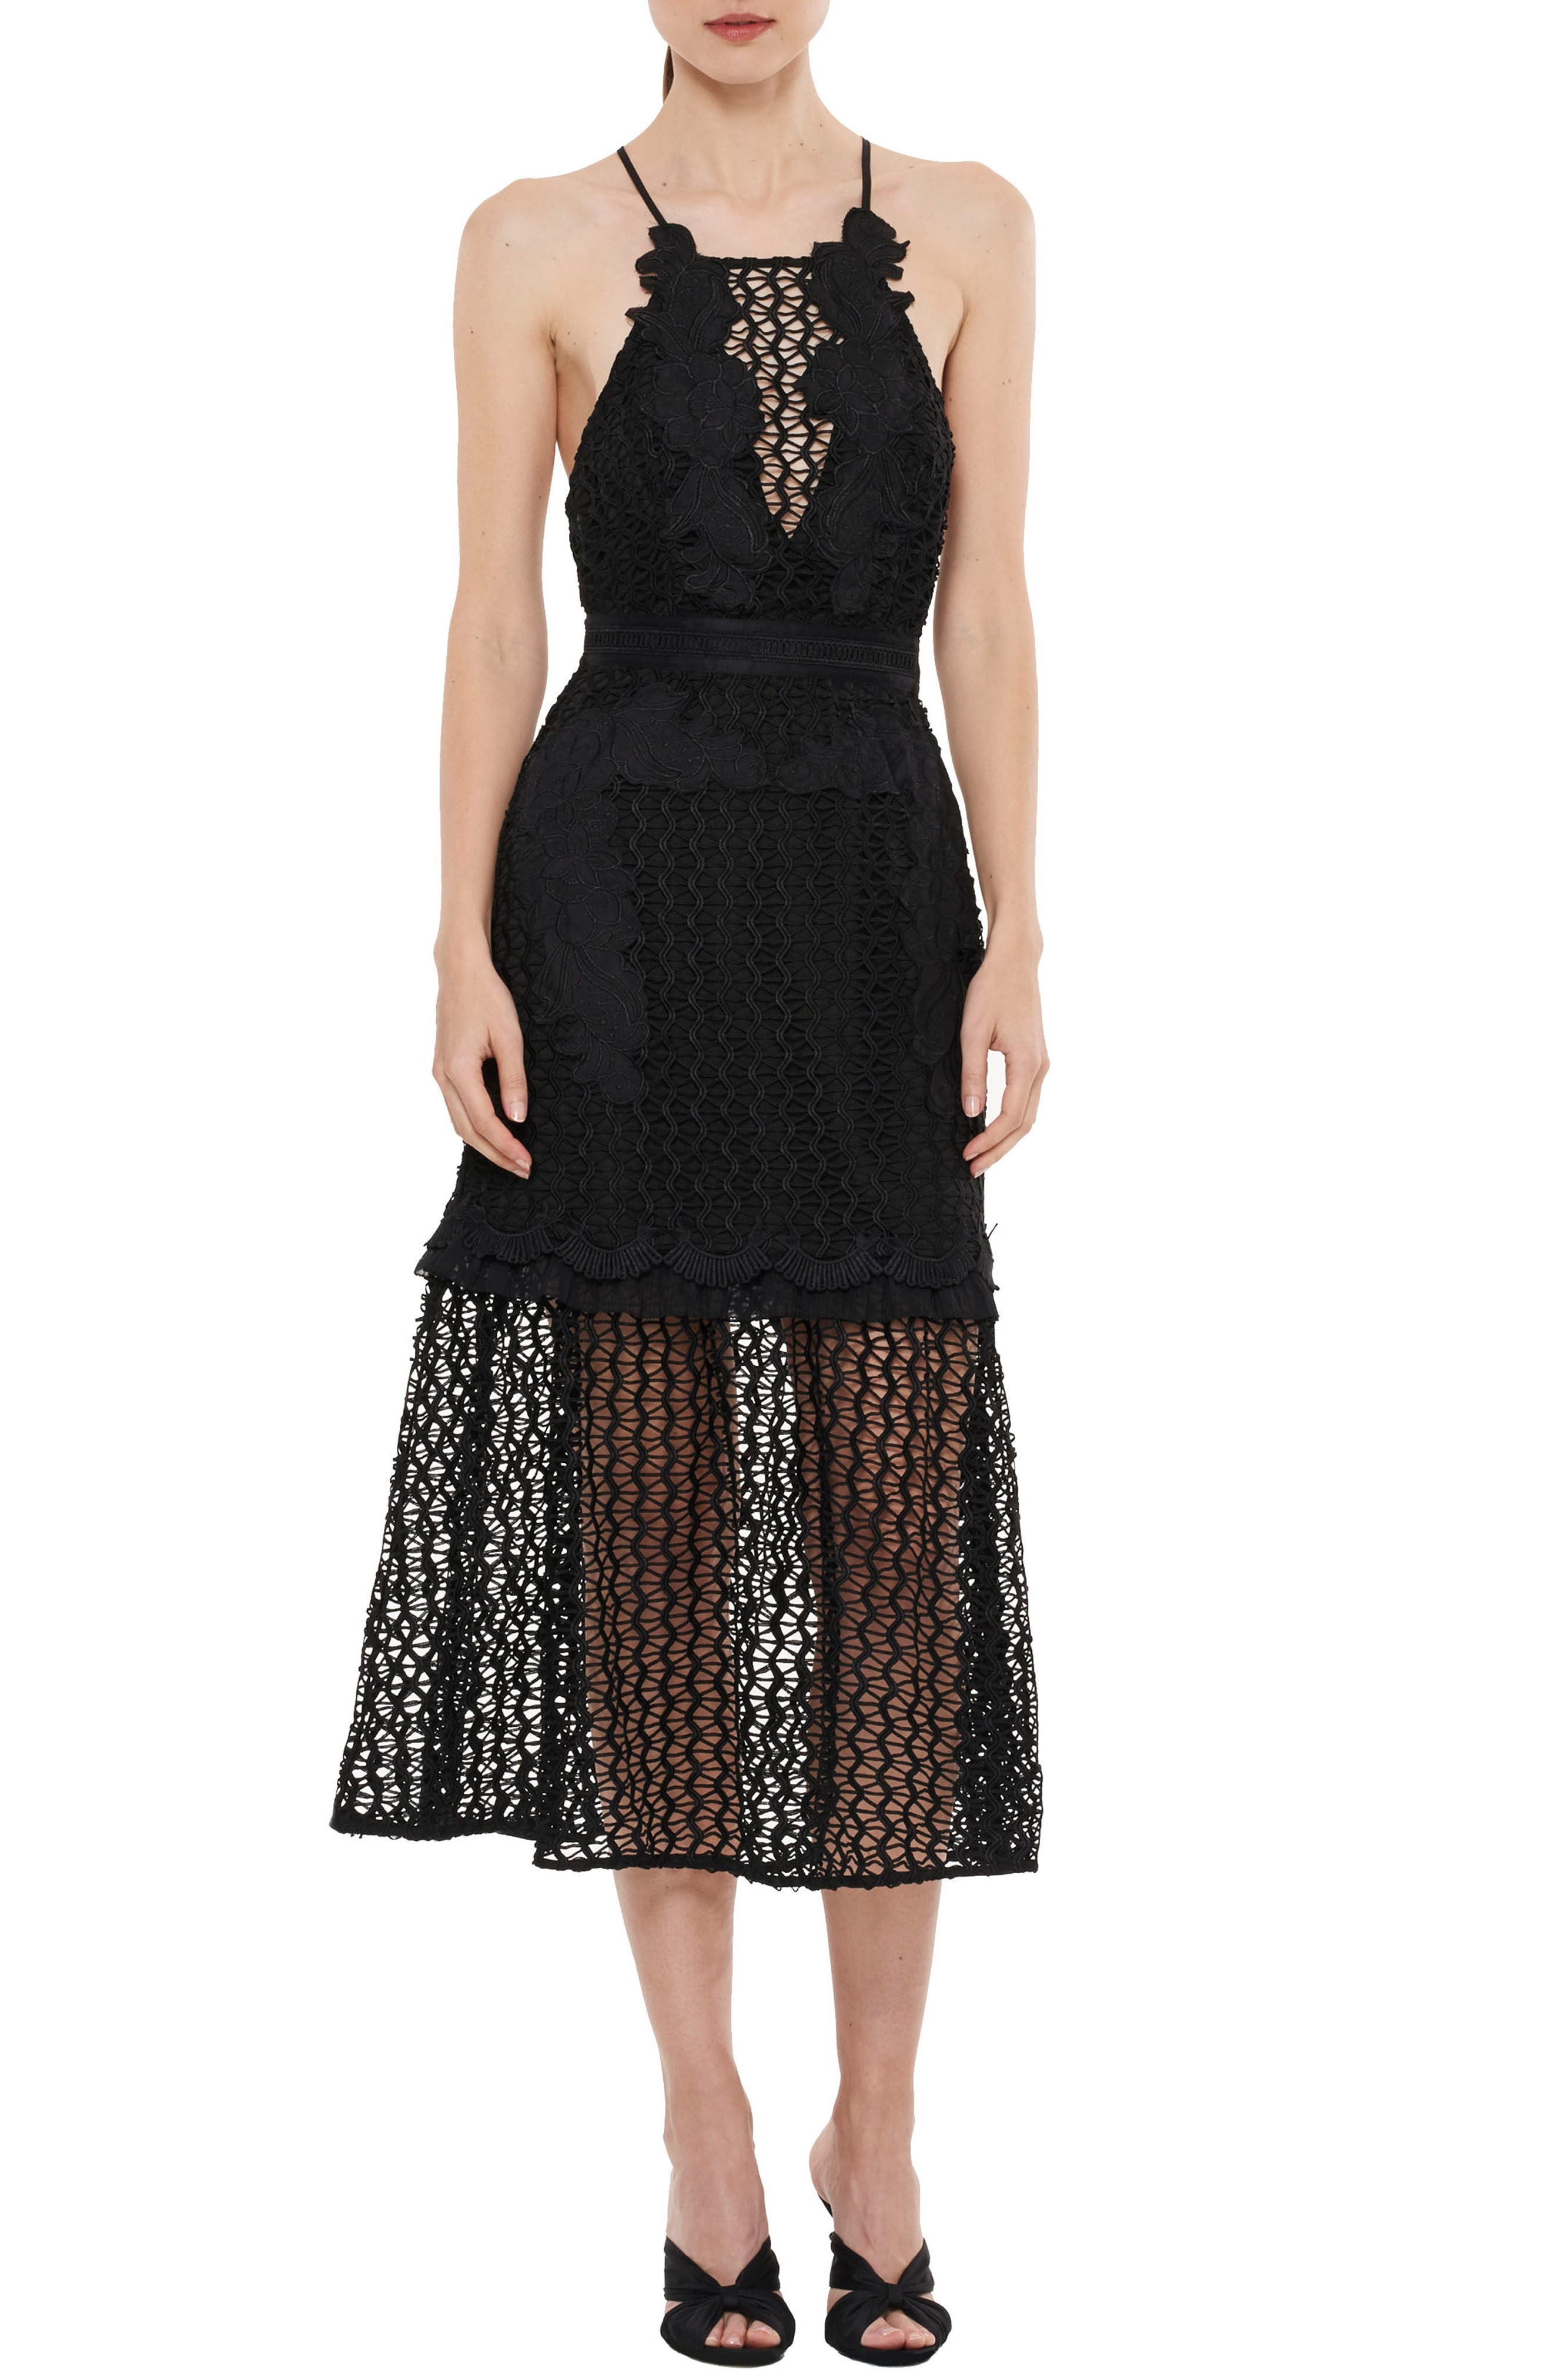 Sweet Dreams Crochet A-Line Dress,                         Main,                         color,